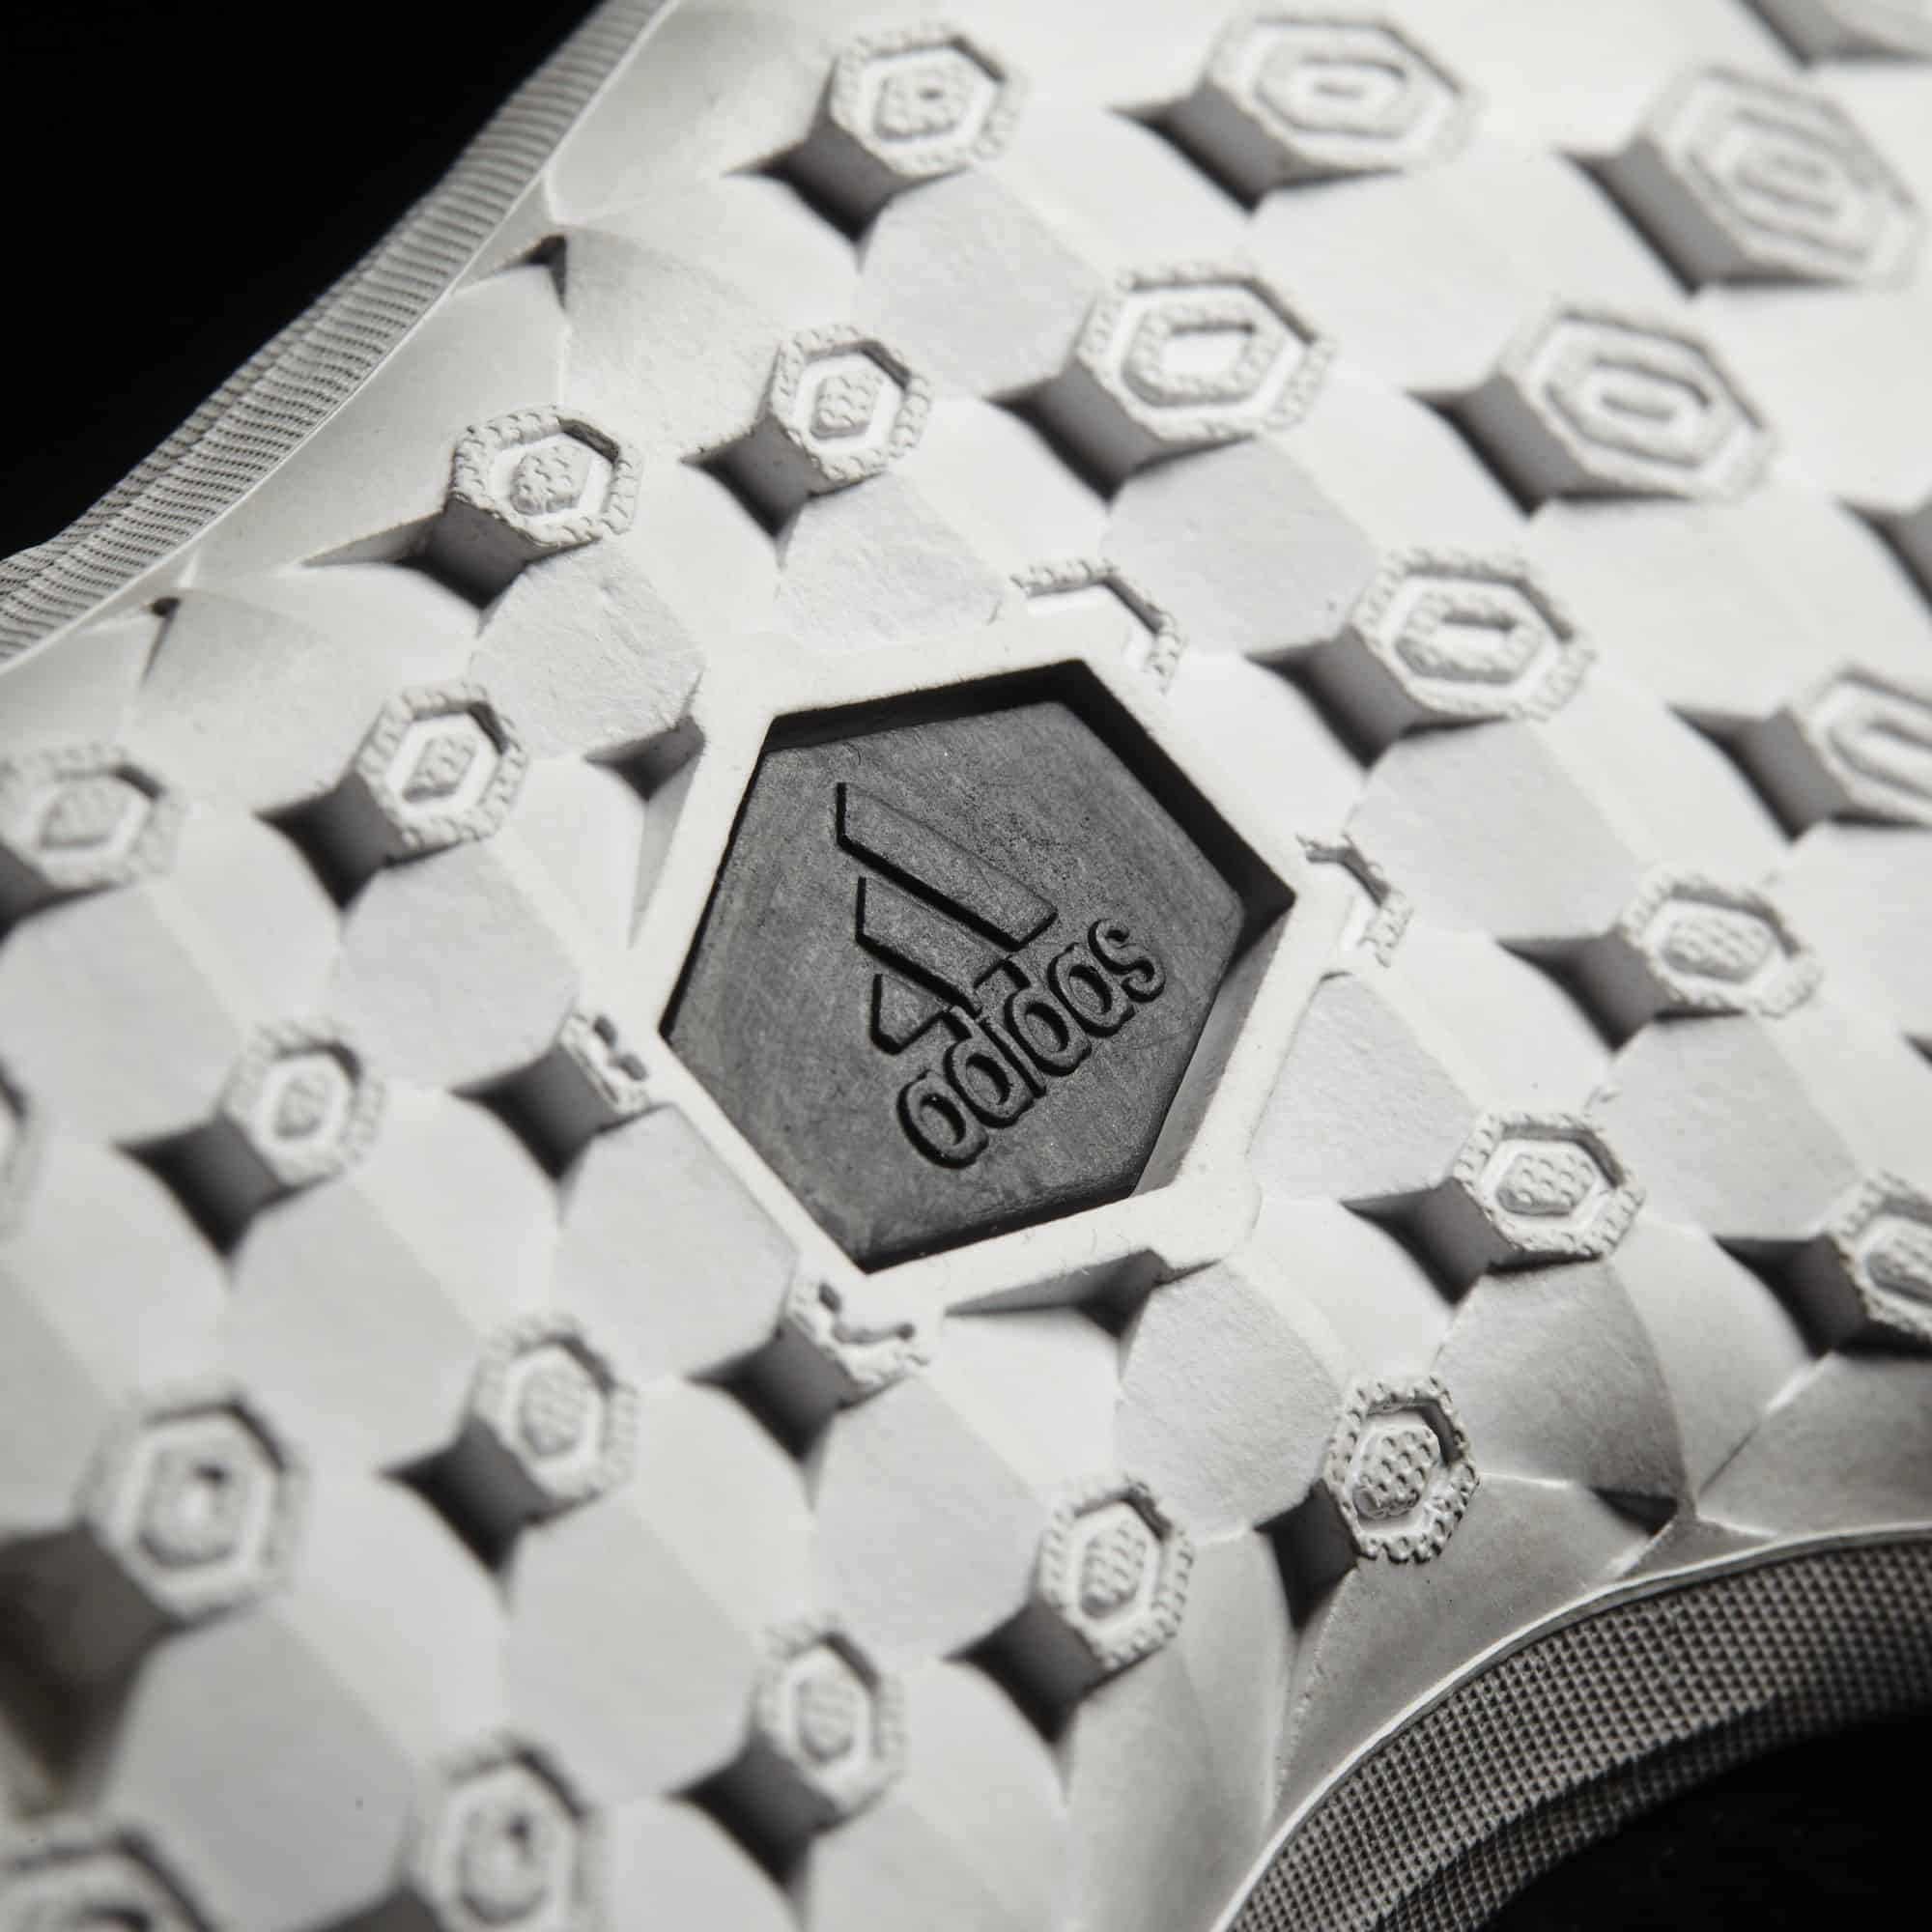 chaussure-football-adidas-ace-tango-17-1-img2